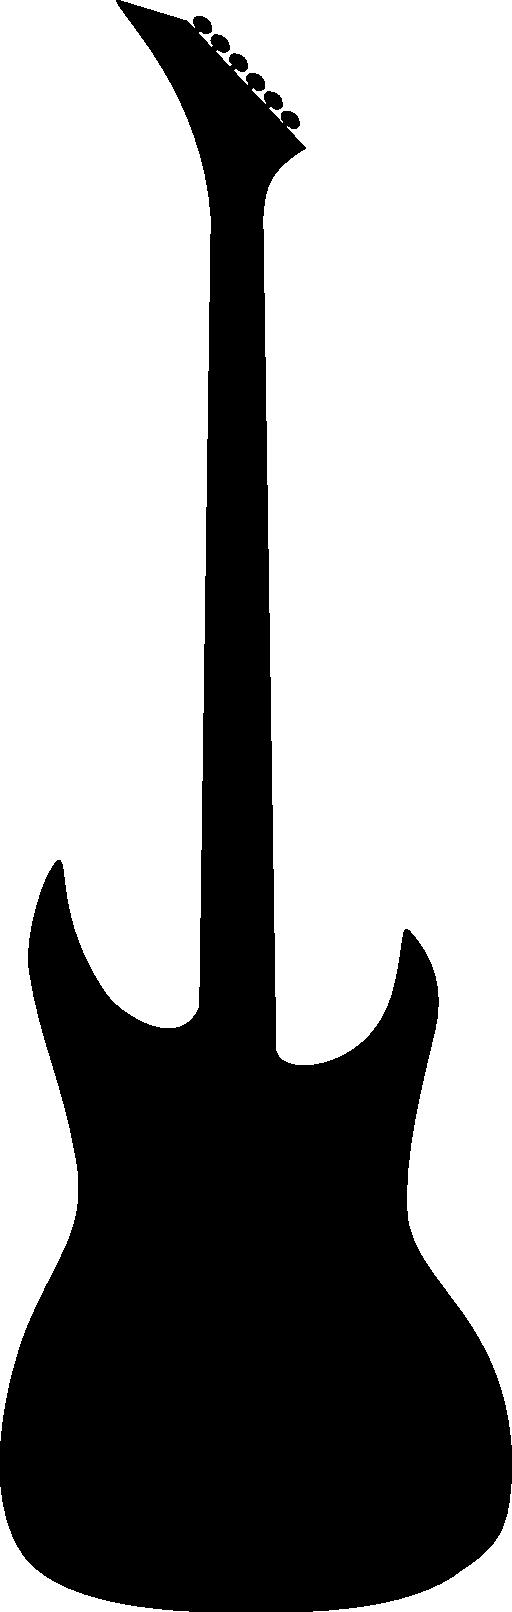 512x1612 Guitar Outline Clip Art Clipart Panda